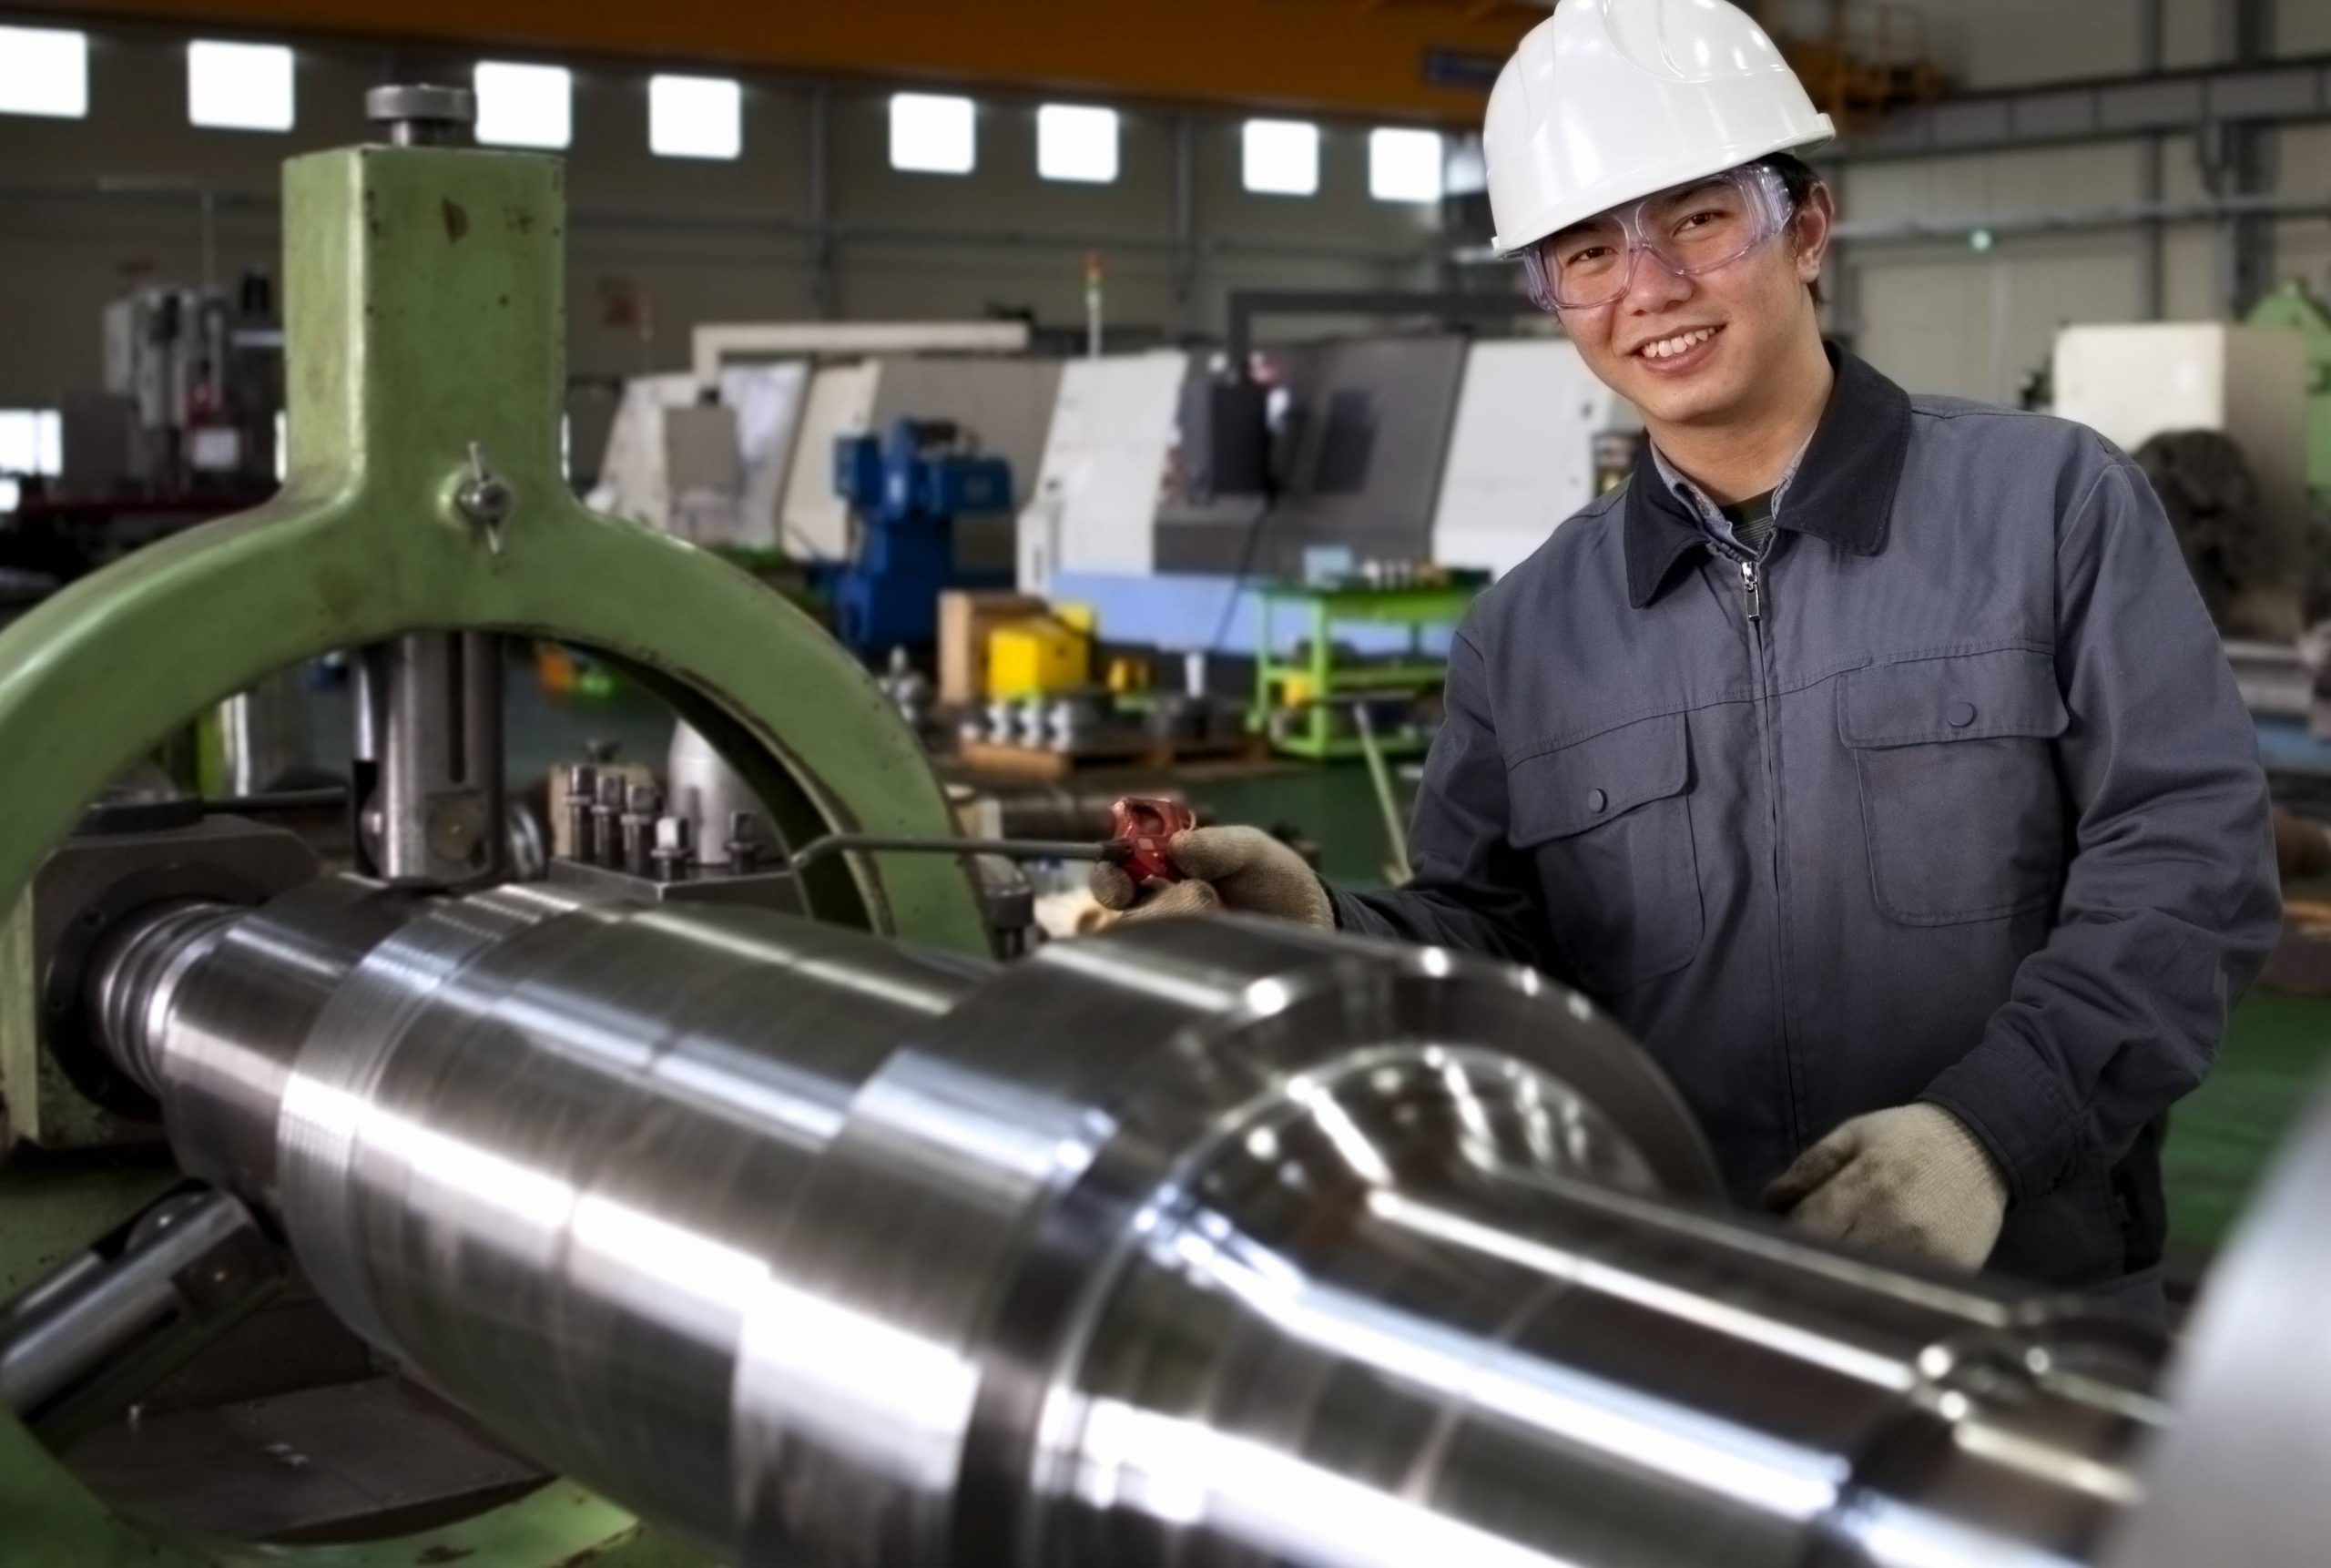 Duales Studium Maschinenbau - Infos Und Freie Plätze ganzes Duales Studium Maschinenbau Firmen